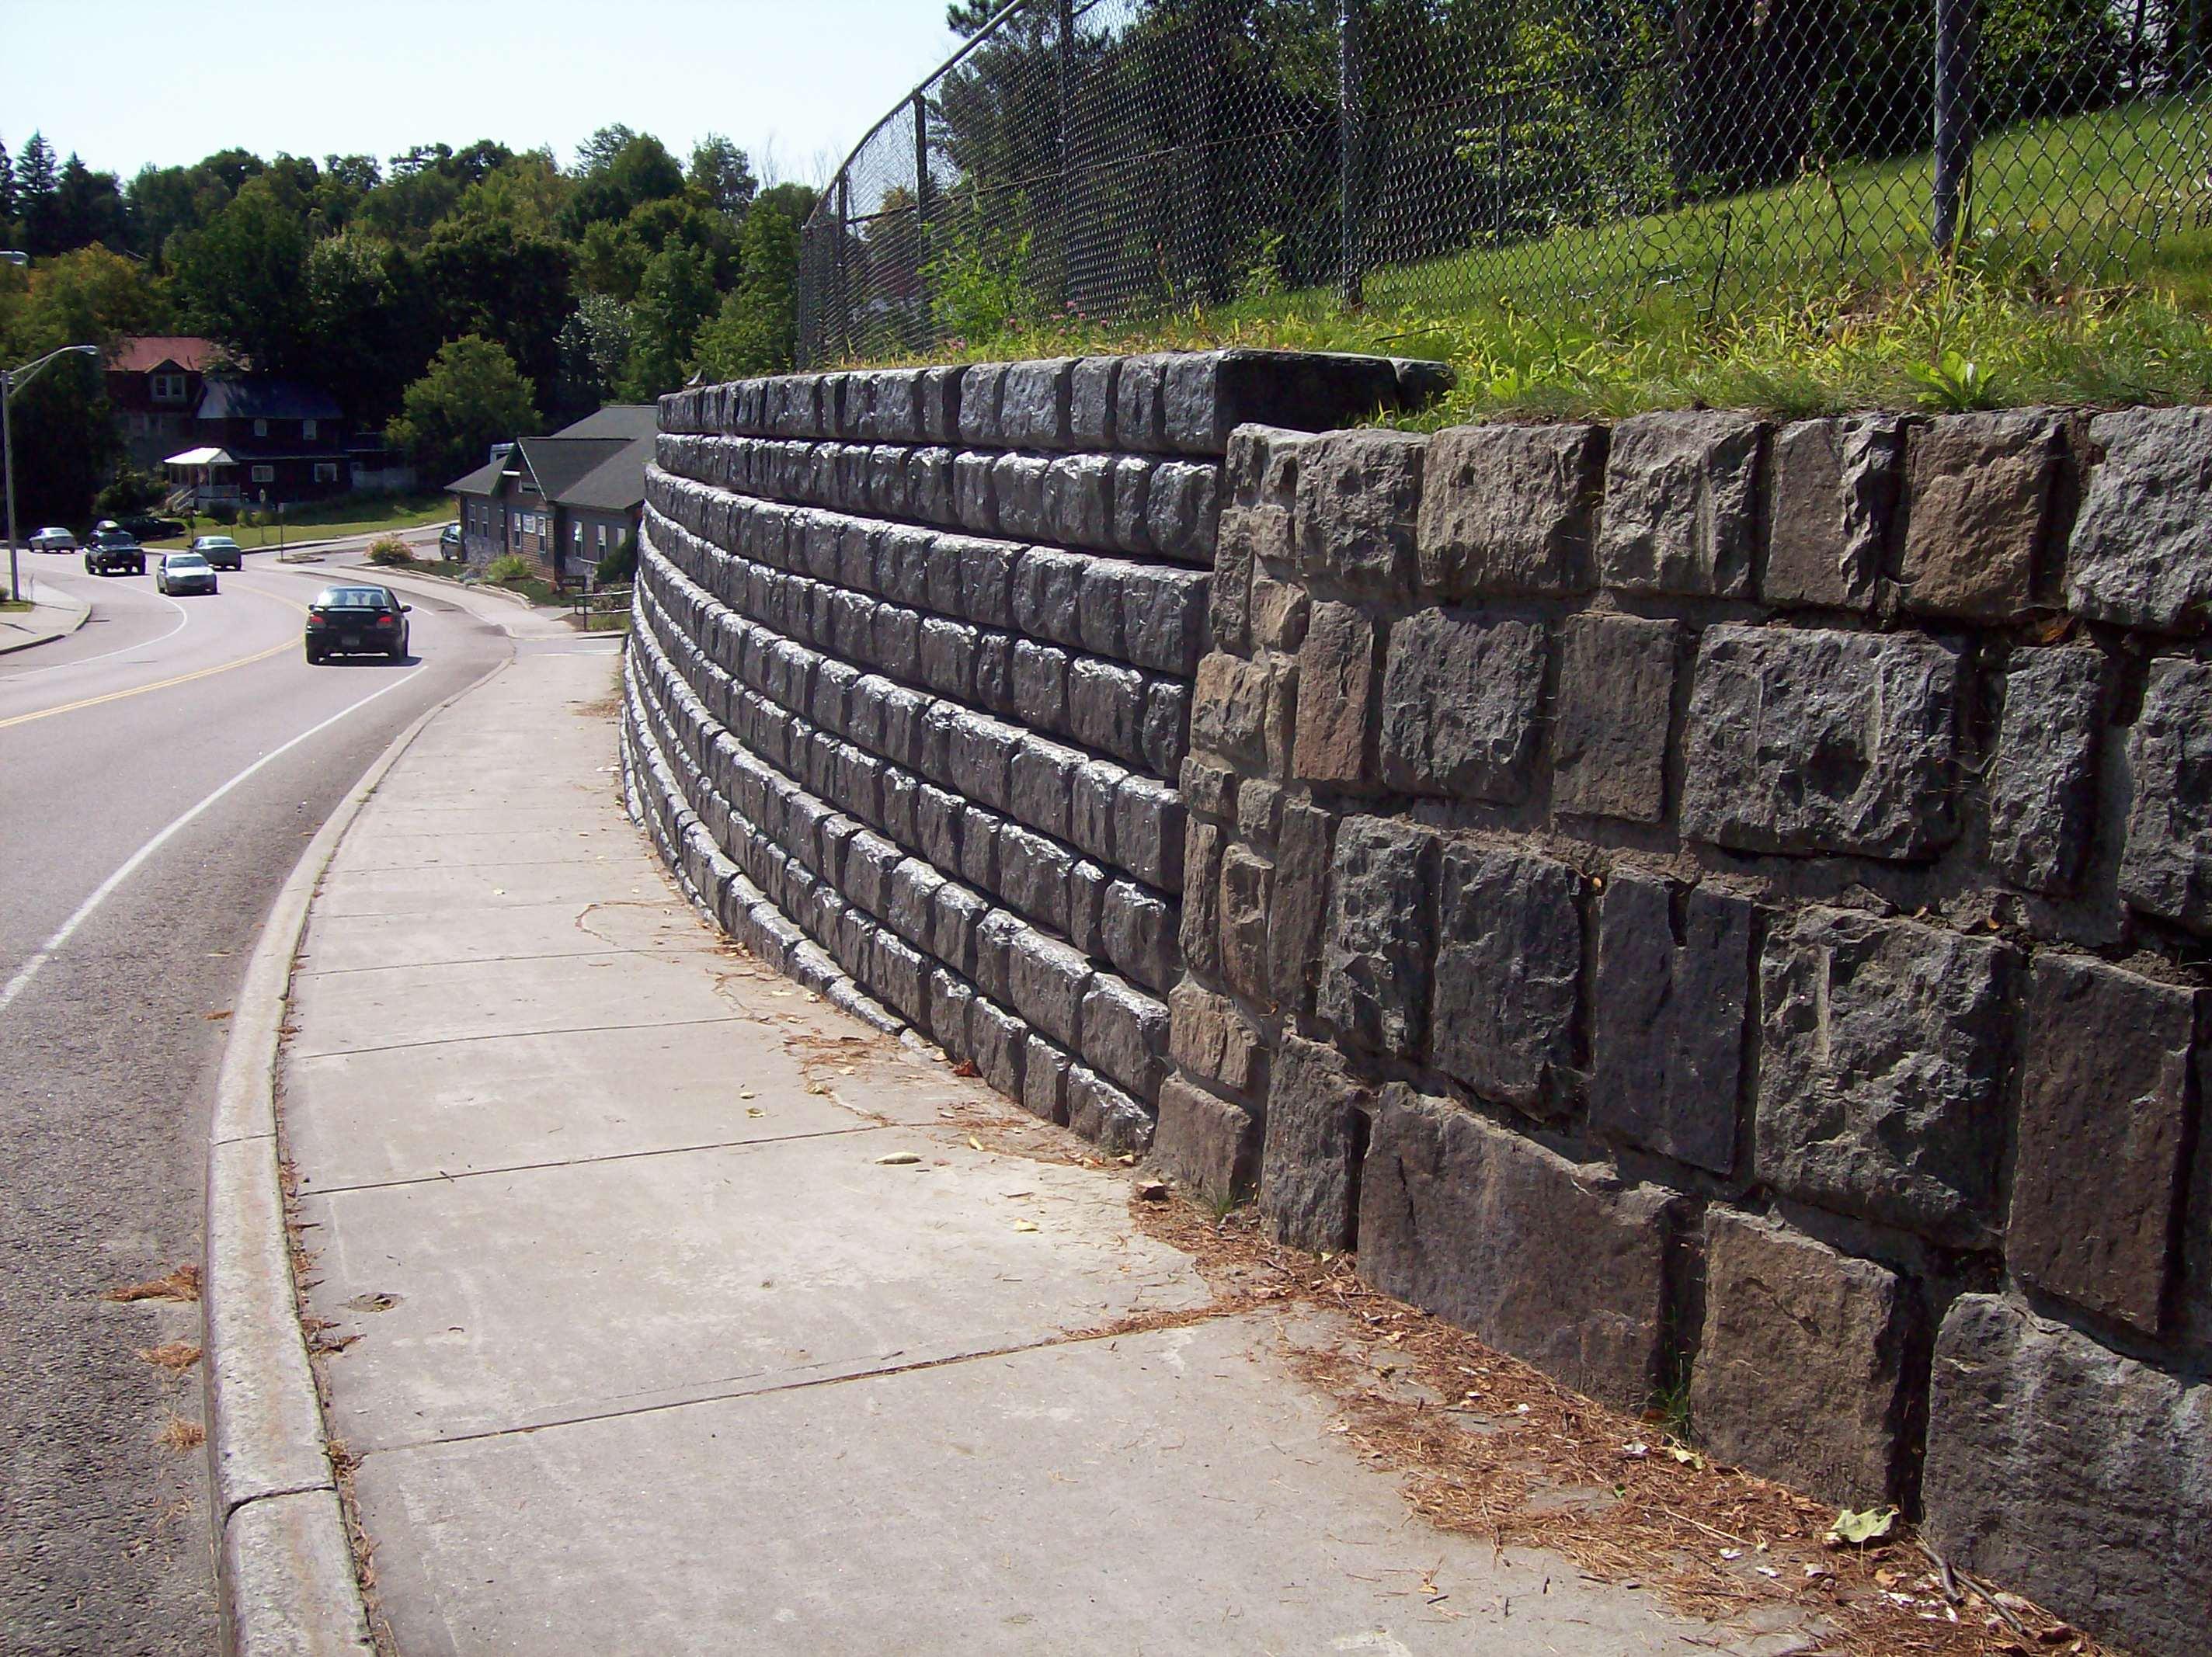 Redi-Rock-cobblestone-gravity-roads-RRAdirondacks-GarwoodPark_1.jpg